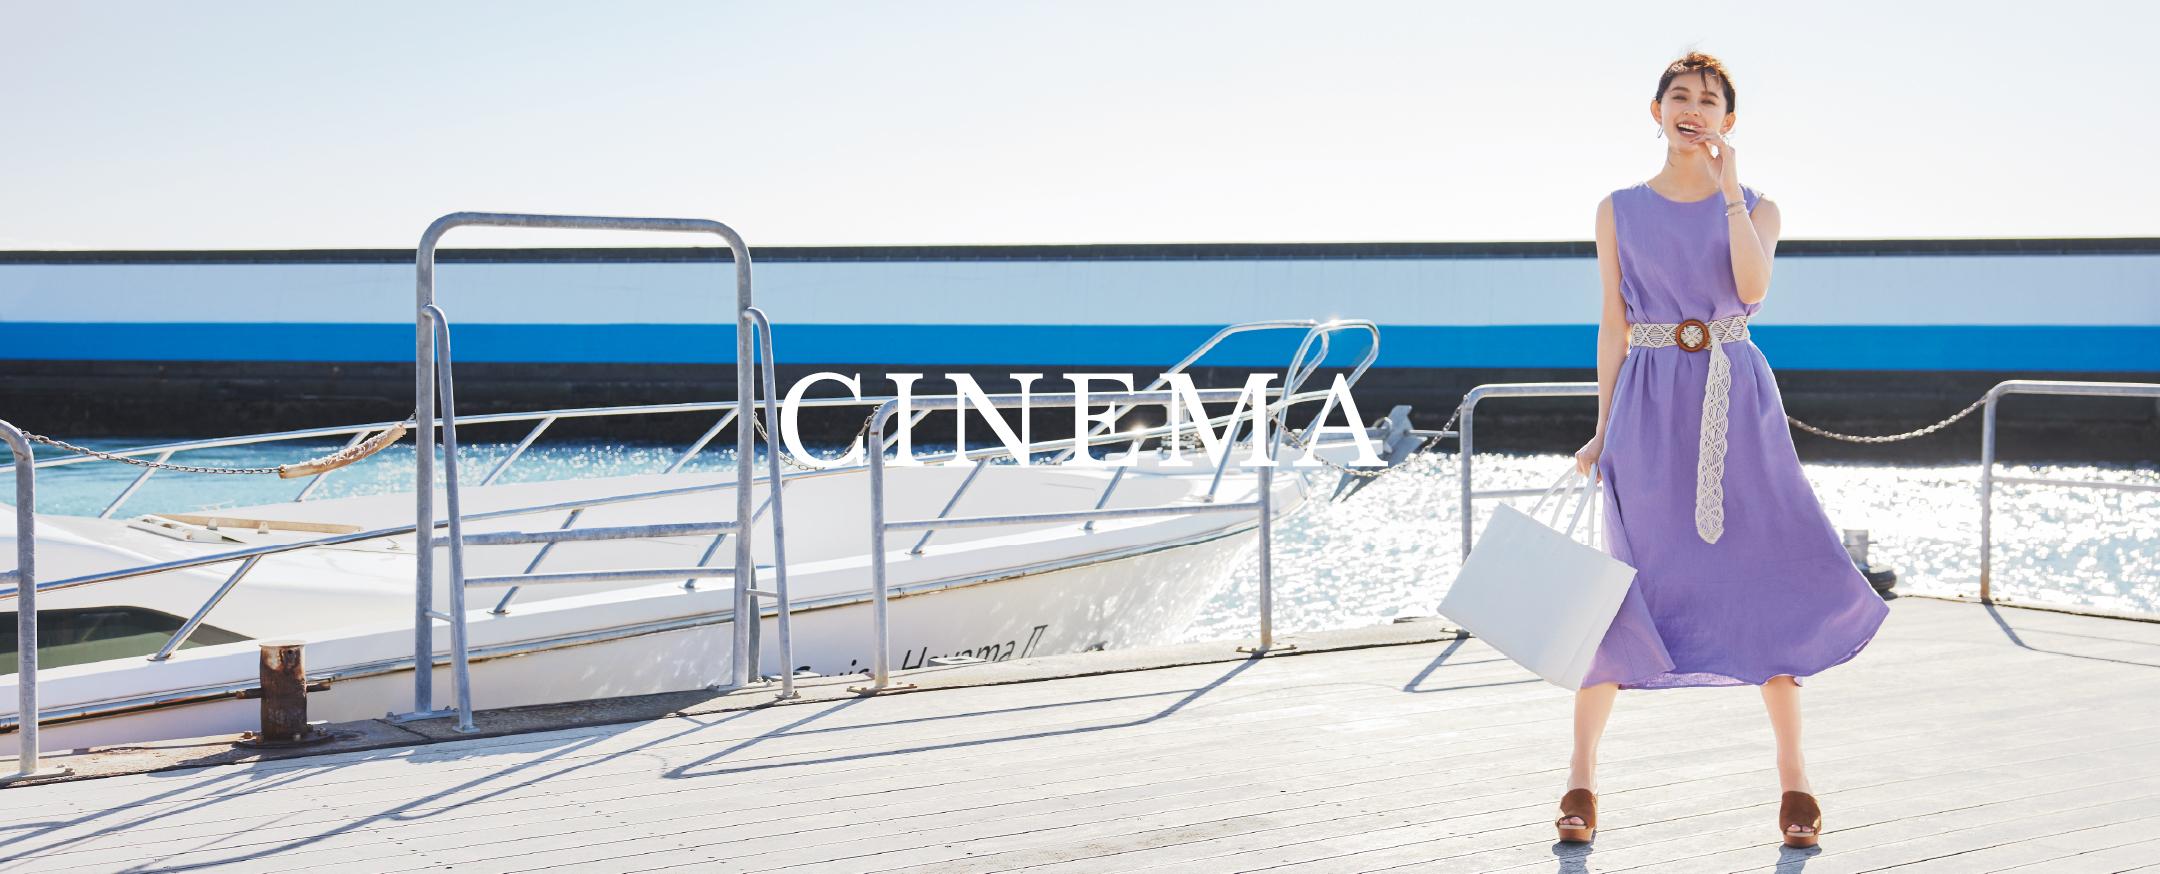 lounie_40th_cinema